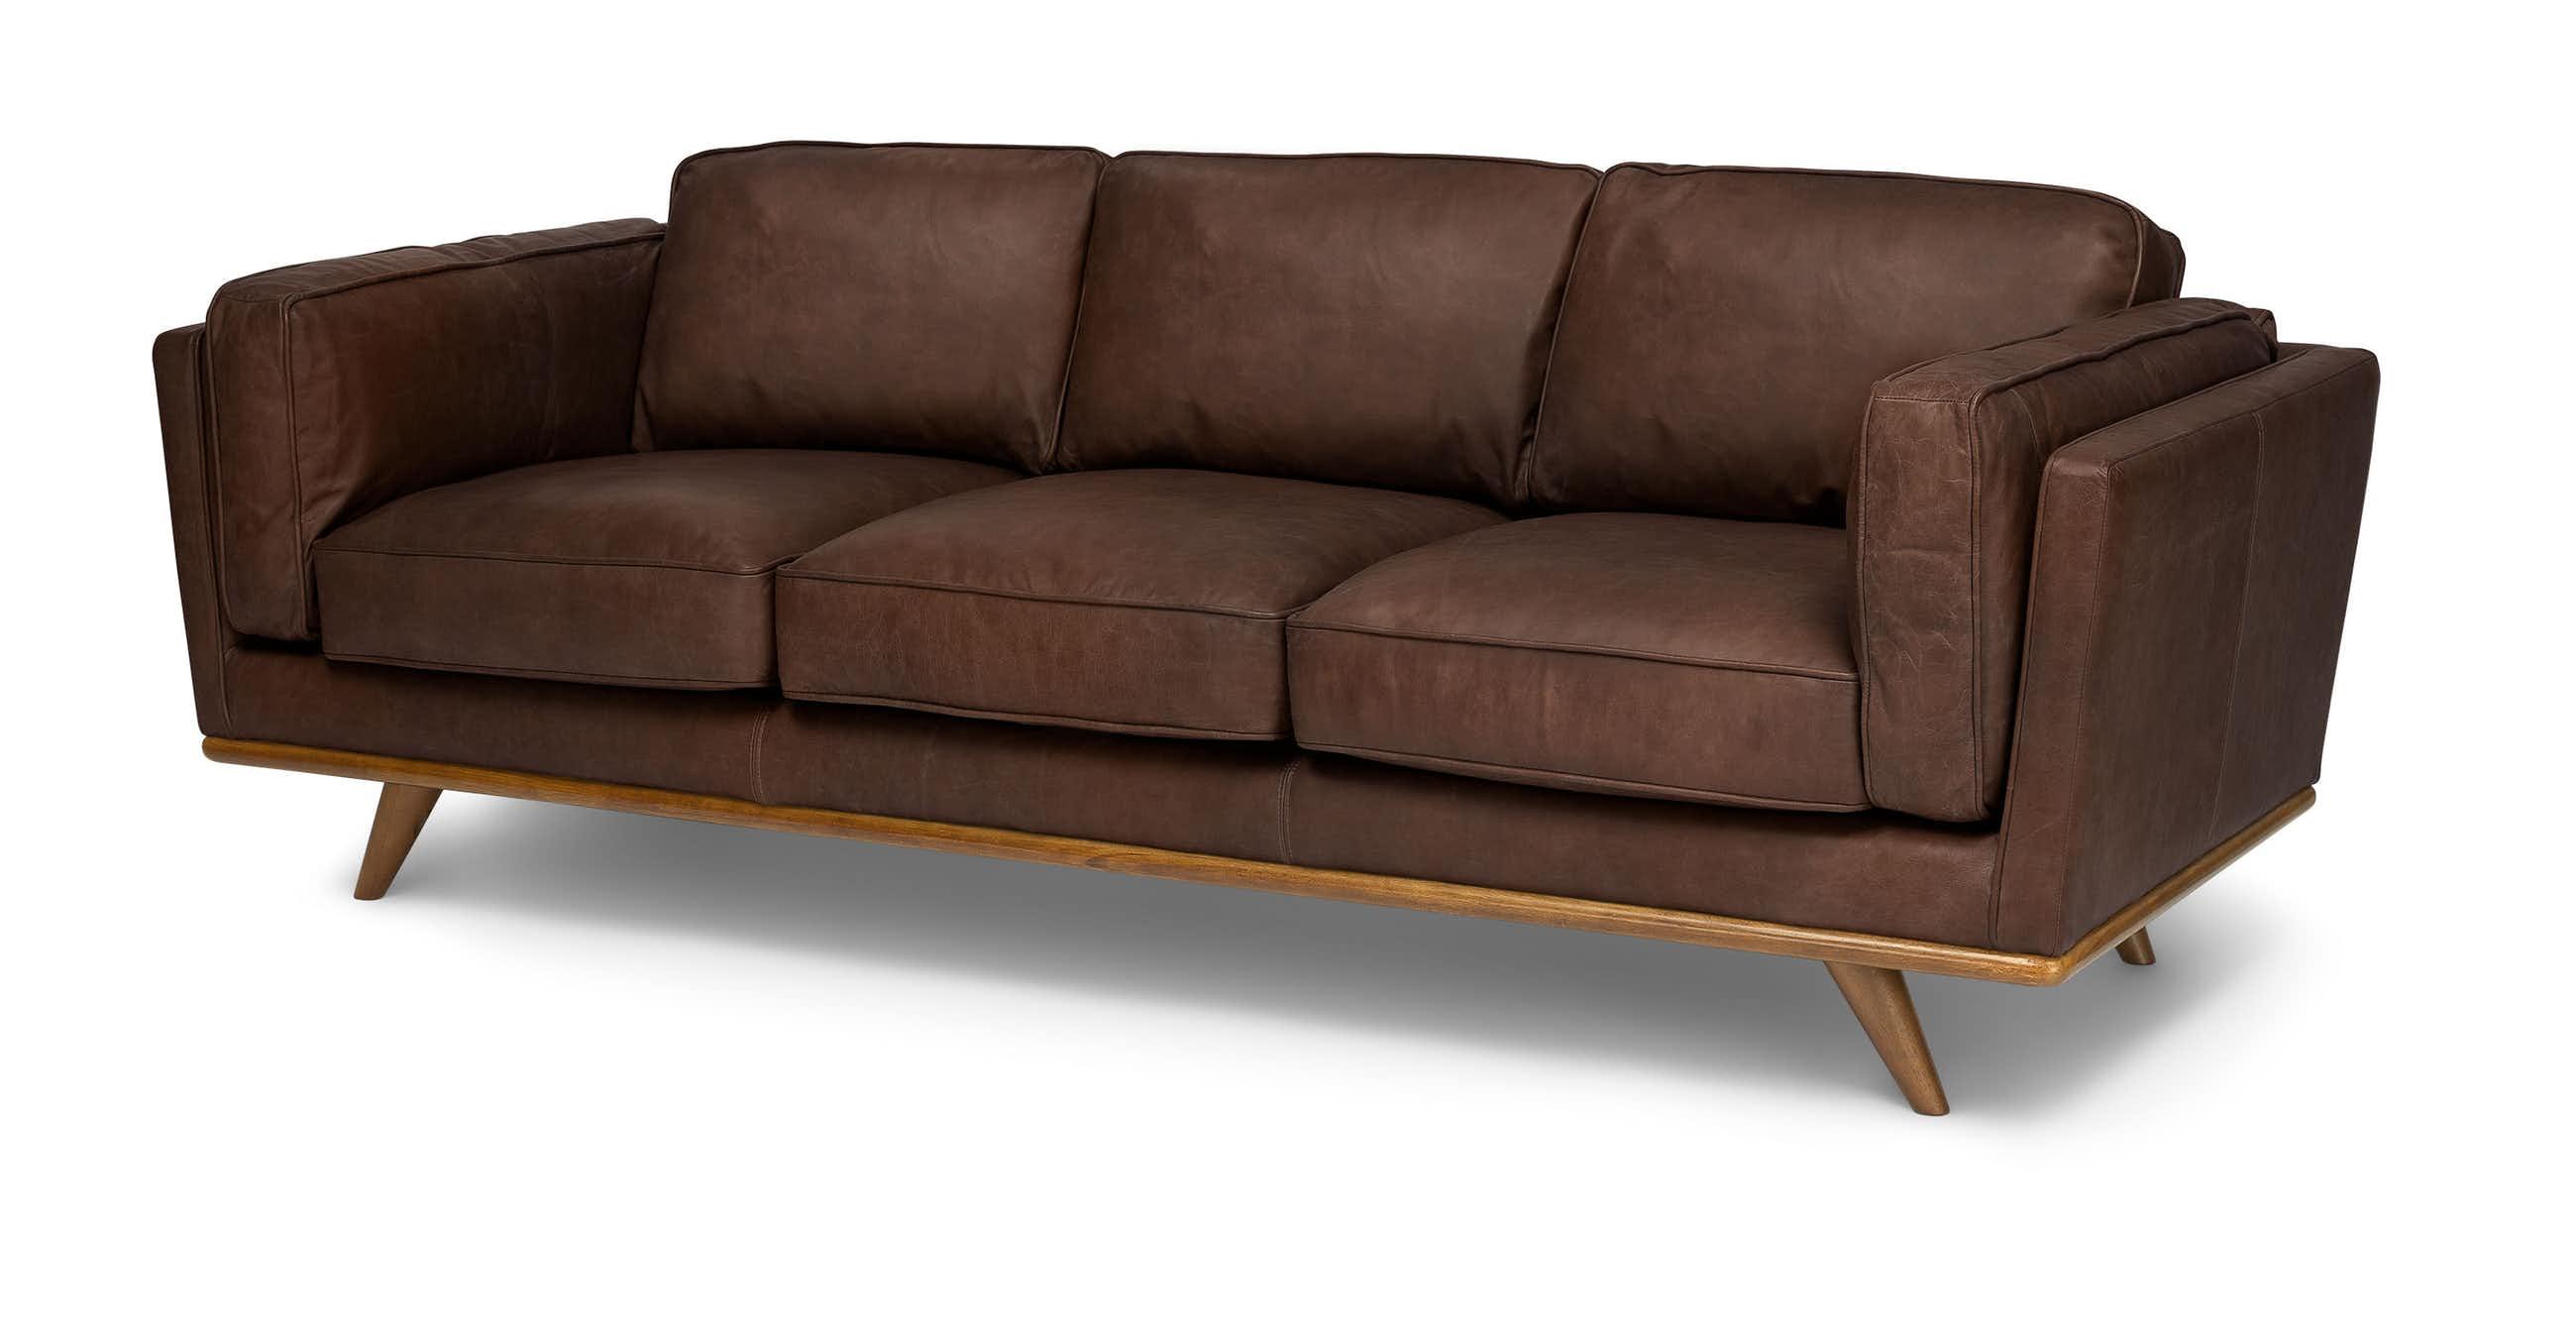 Timber Charme Chocolat Sofa